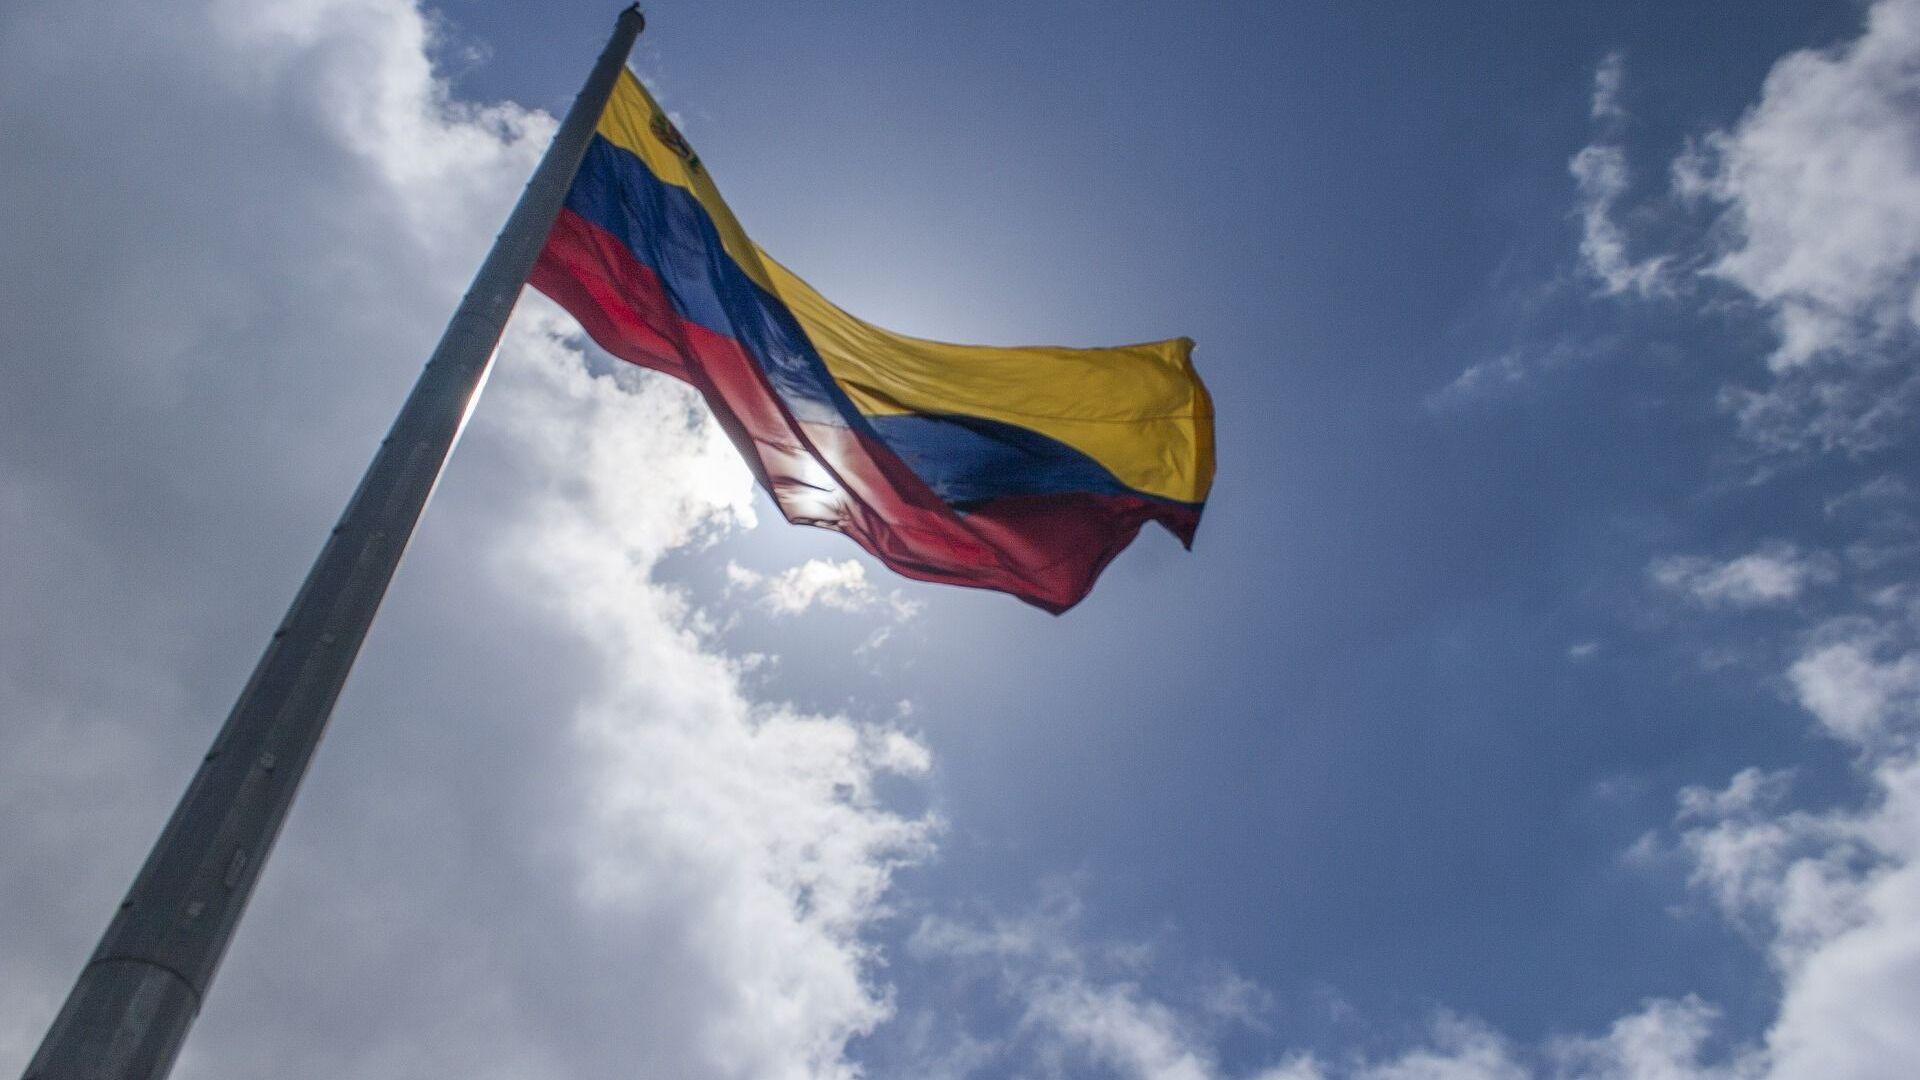 Bandera de Venezuela - Sputnik Mundo, 1920, 03.03.2021